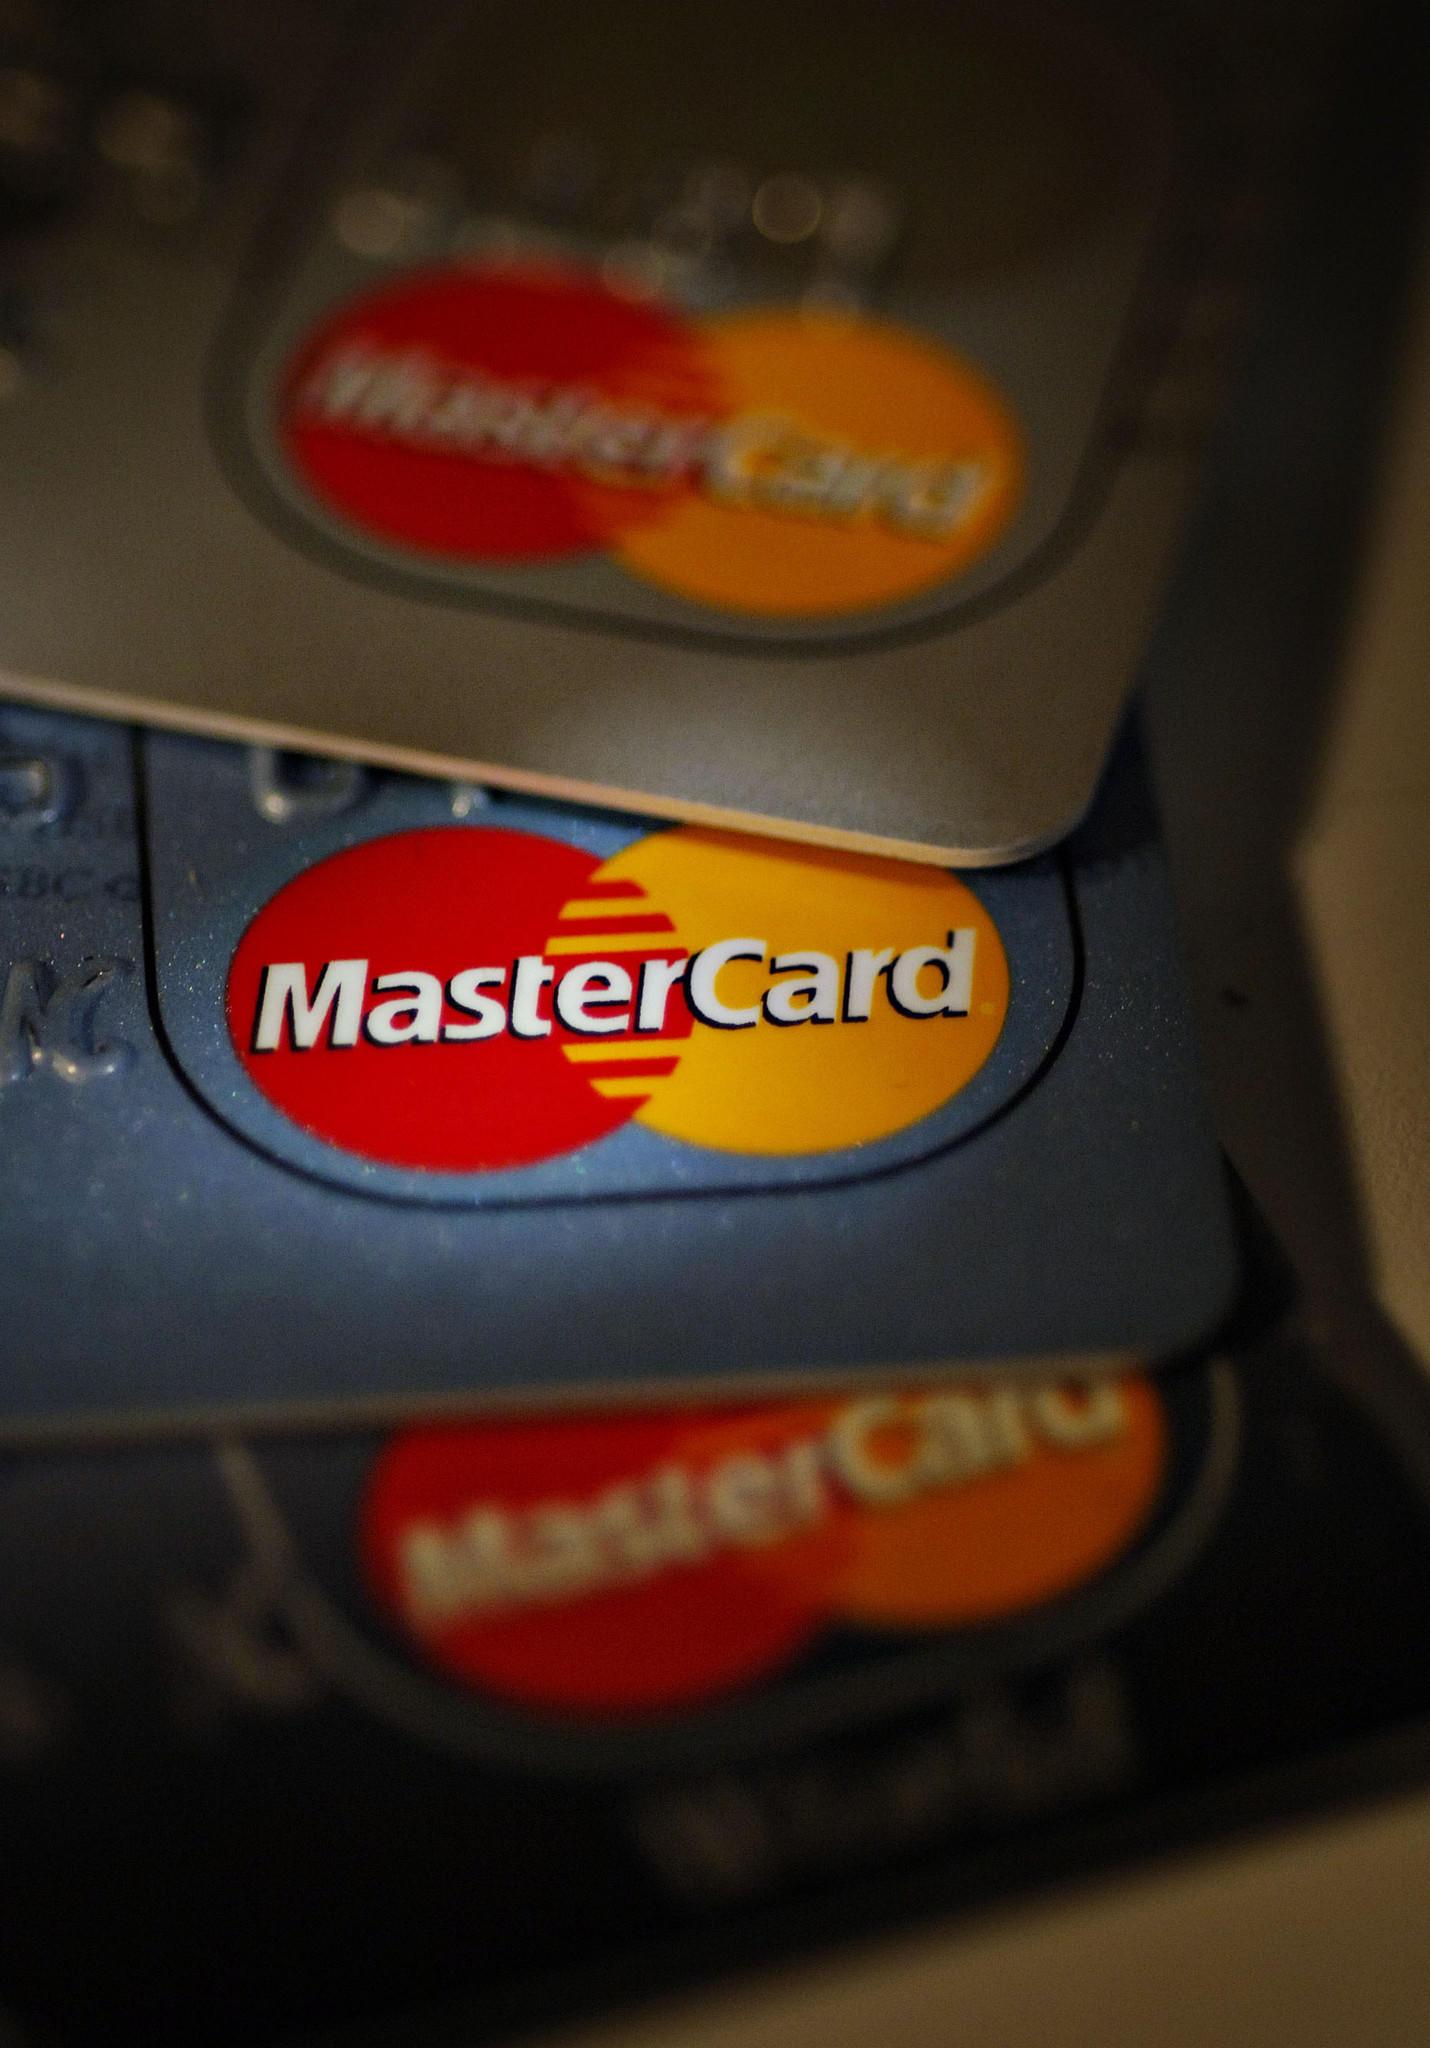 MasterCard credit cards